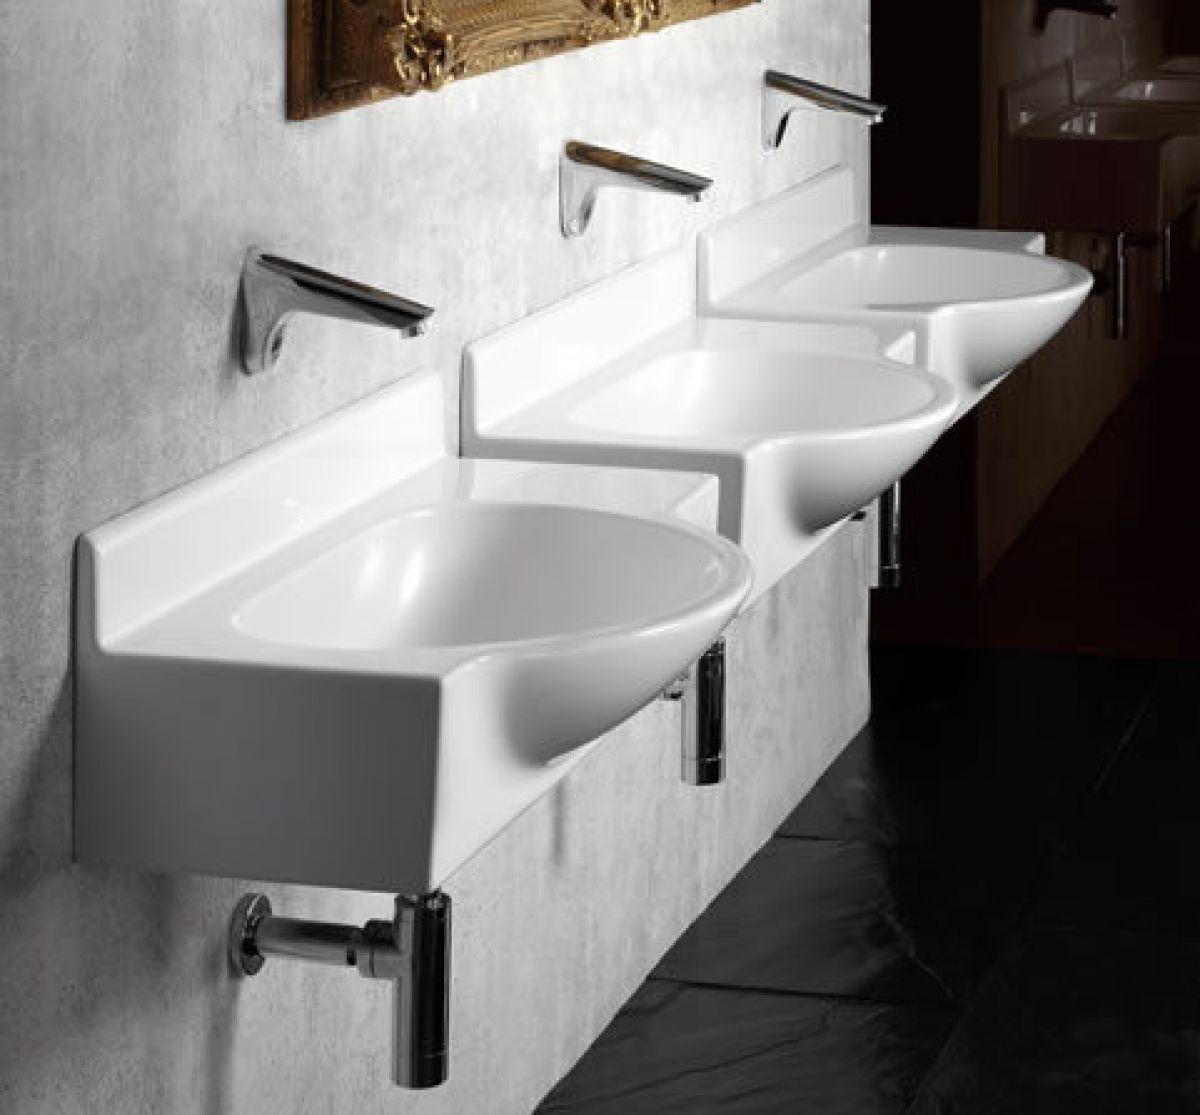 Armitage shanks bathroom sinks - Armitage Shanks Airside Wall Hung Basin